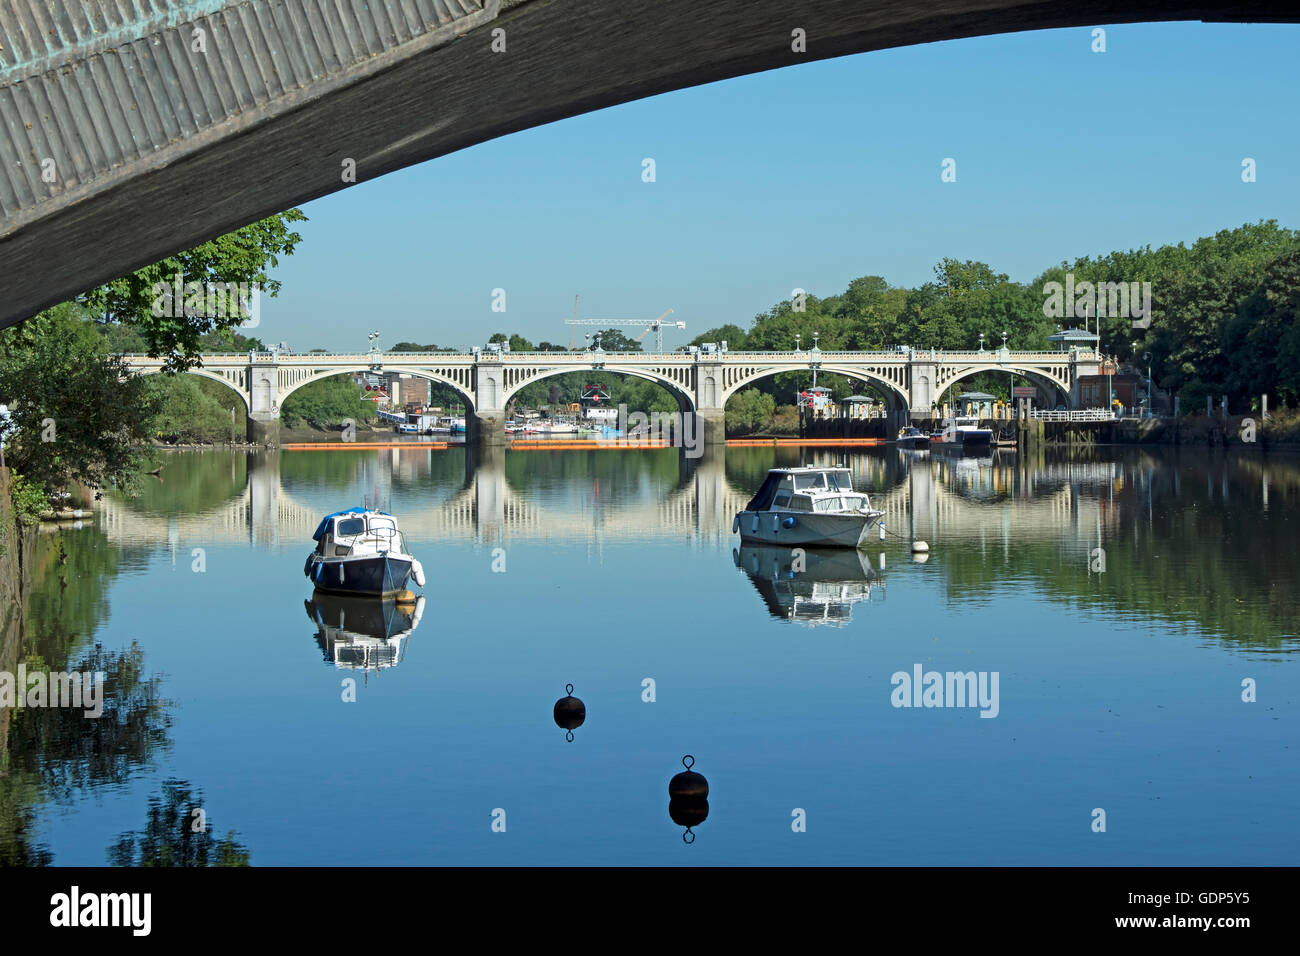 river thames seen from st magarets looking towards richmond lock beneath an arch of twickenham bridge Stock Photo